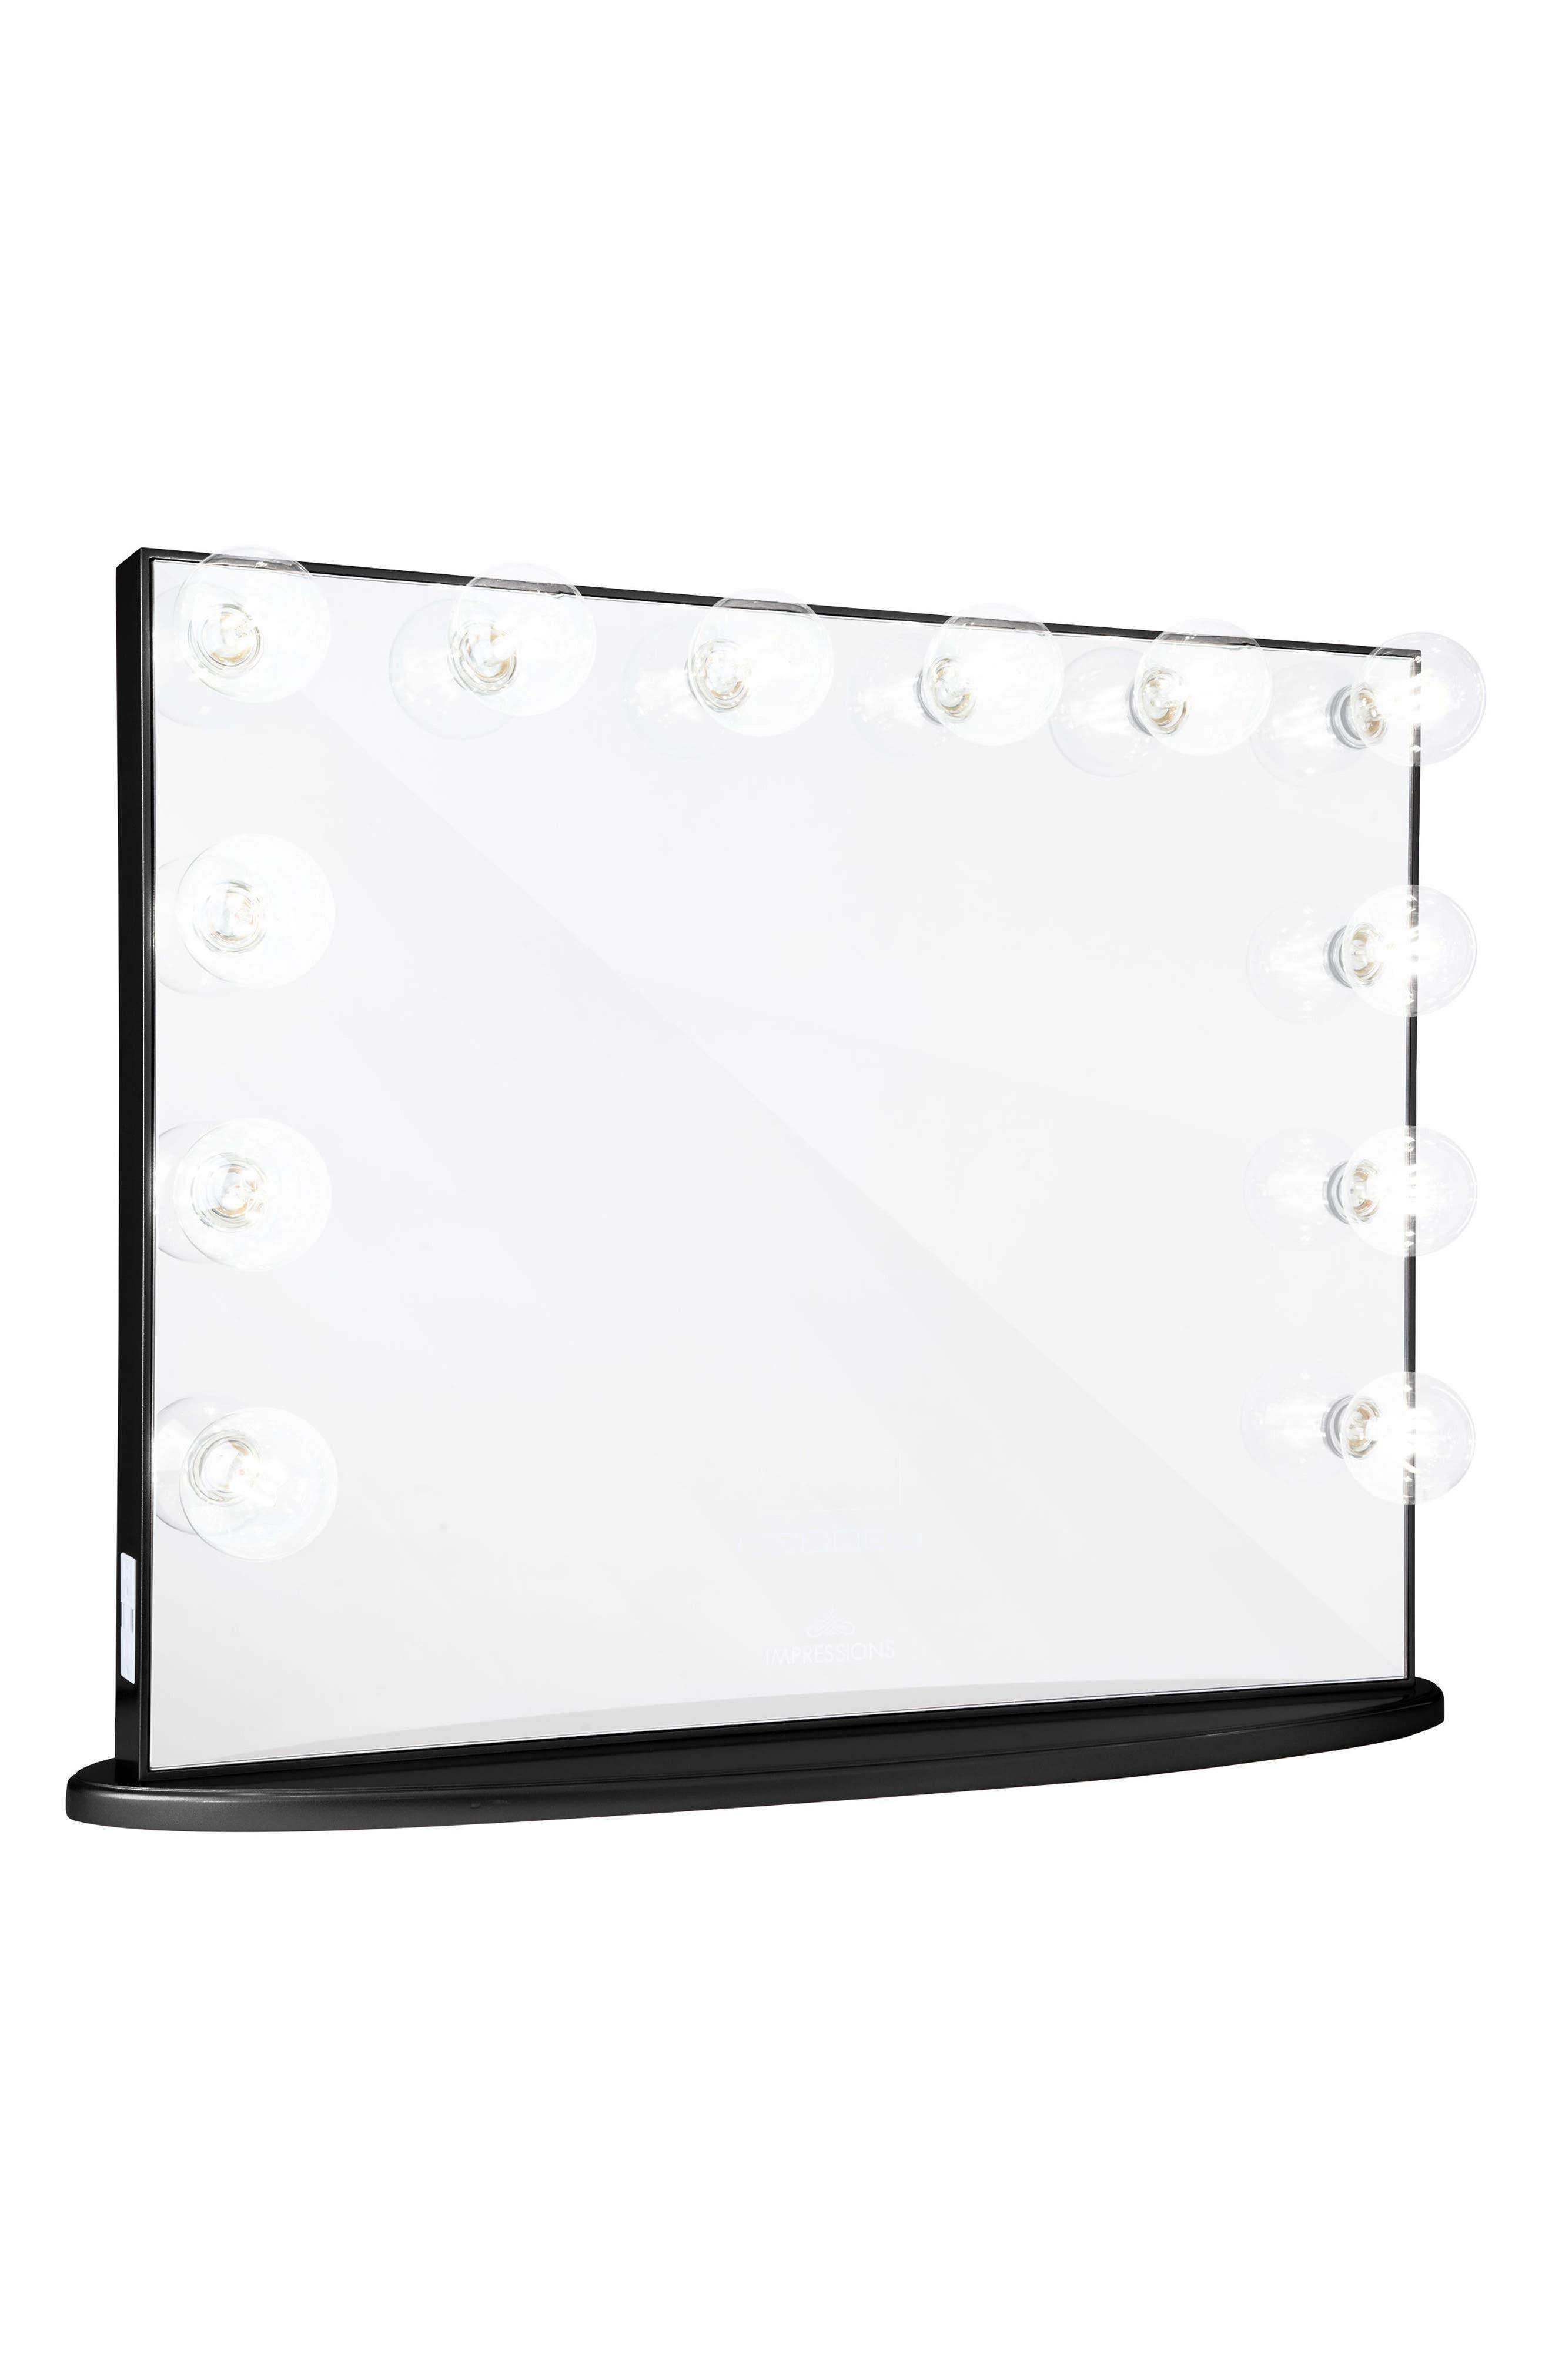 Alternate Image 1 Selected - Impressions Vanity Co. Hollywood Glow™ Plus LED Vanity Mirror